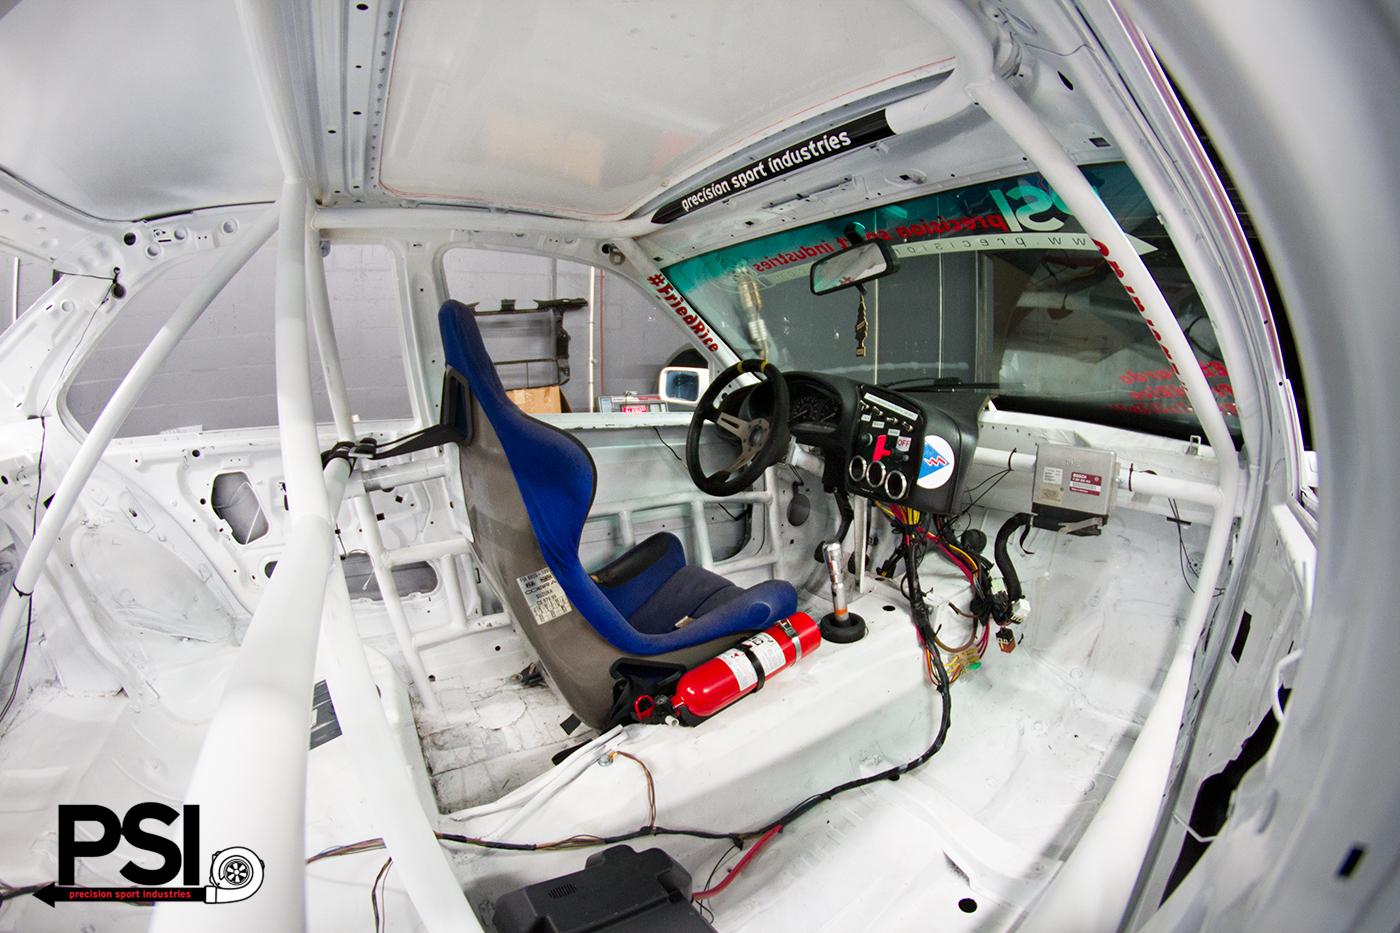 bmw e36 race car wiring wiring diagram  bmw e36 race car wiring wiring diagrams